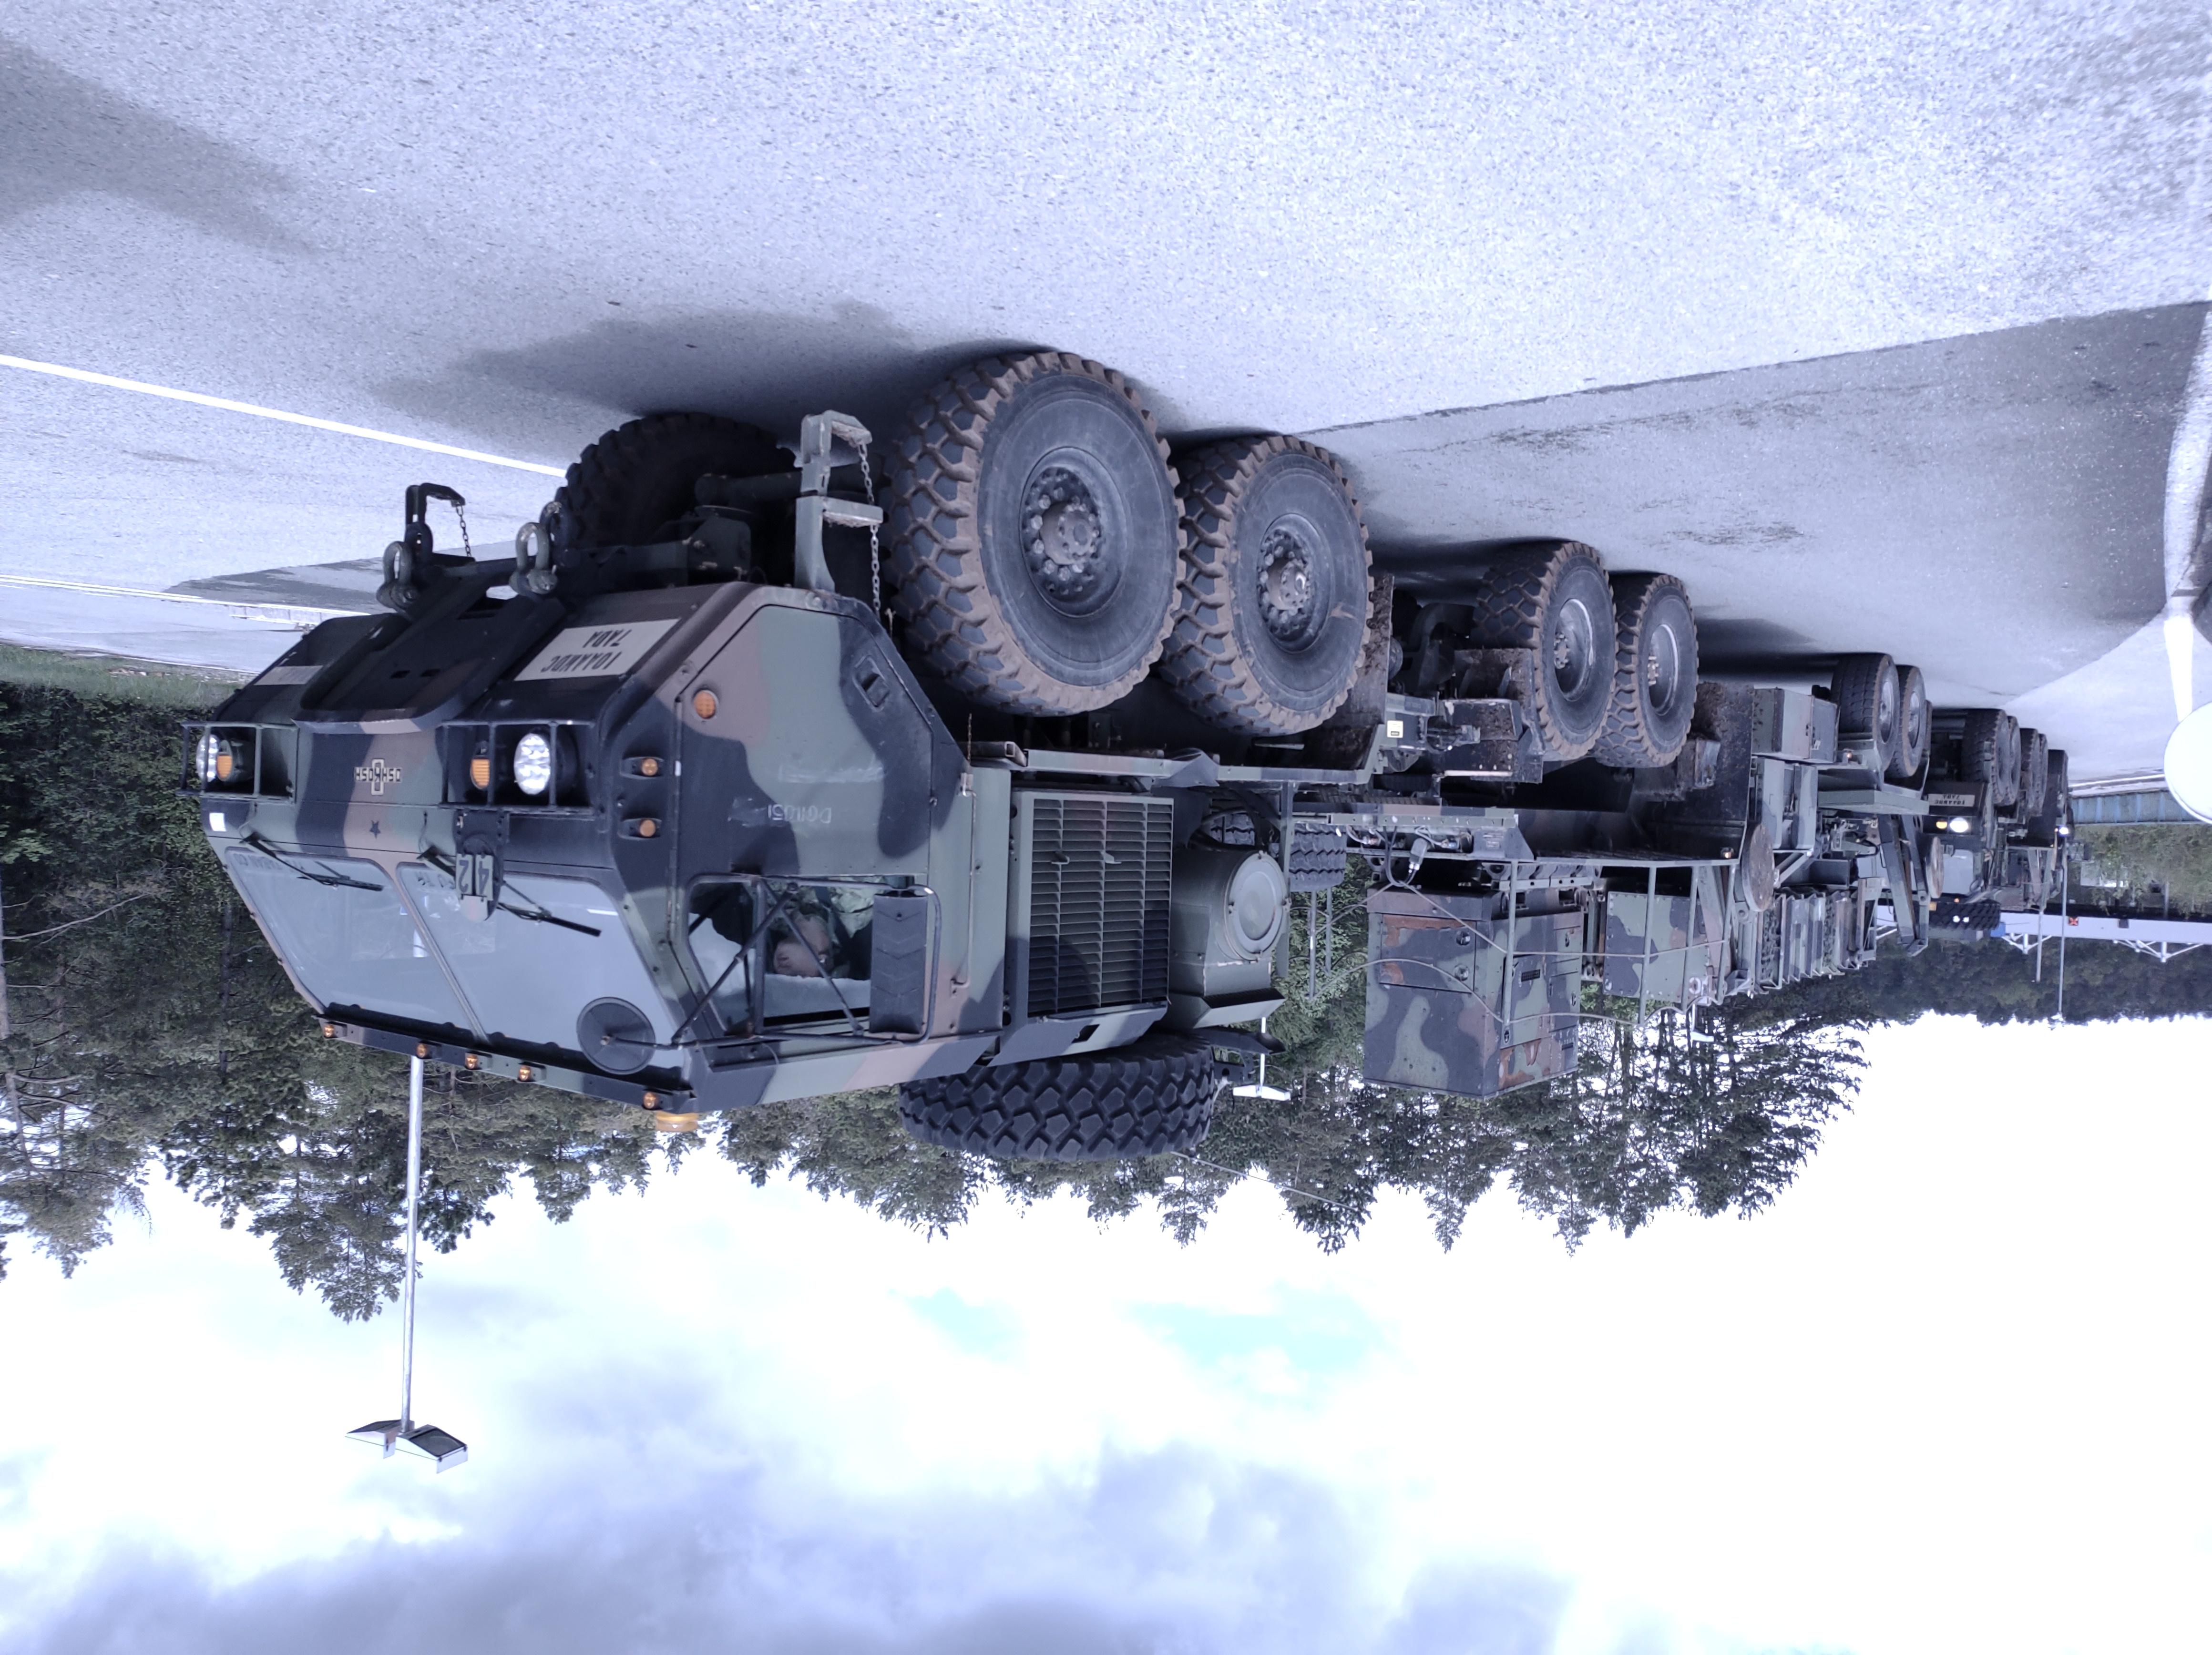 Američki sustav protuzračne obrane Patriot stiže u Zemunik